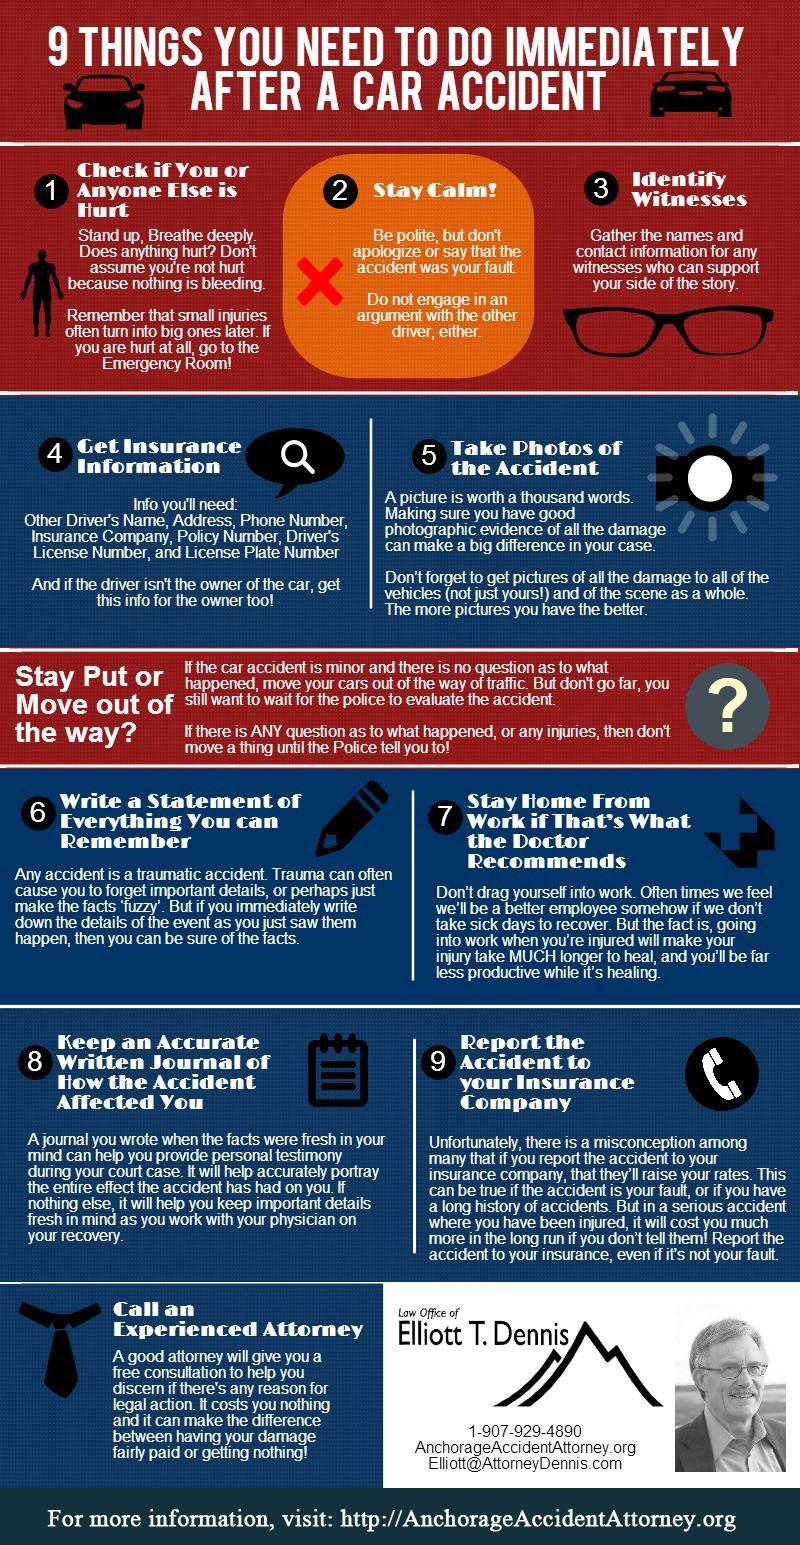 Car infographics tips info safedriving car care tips